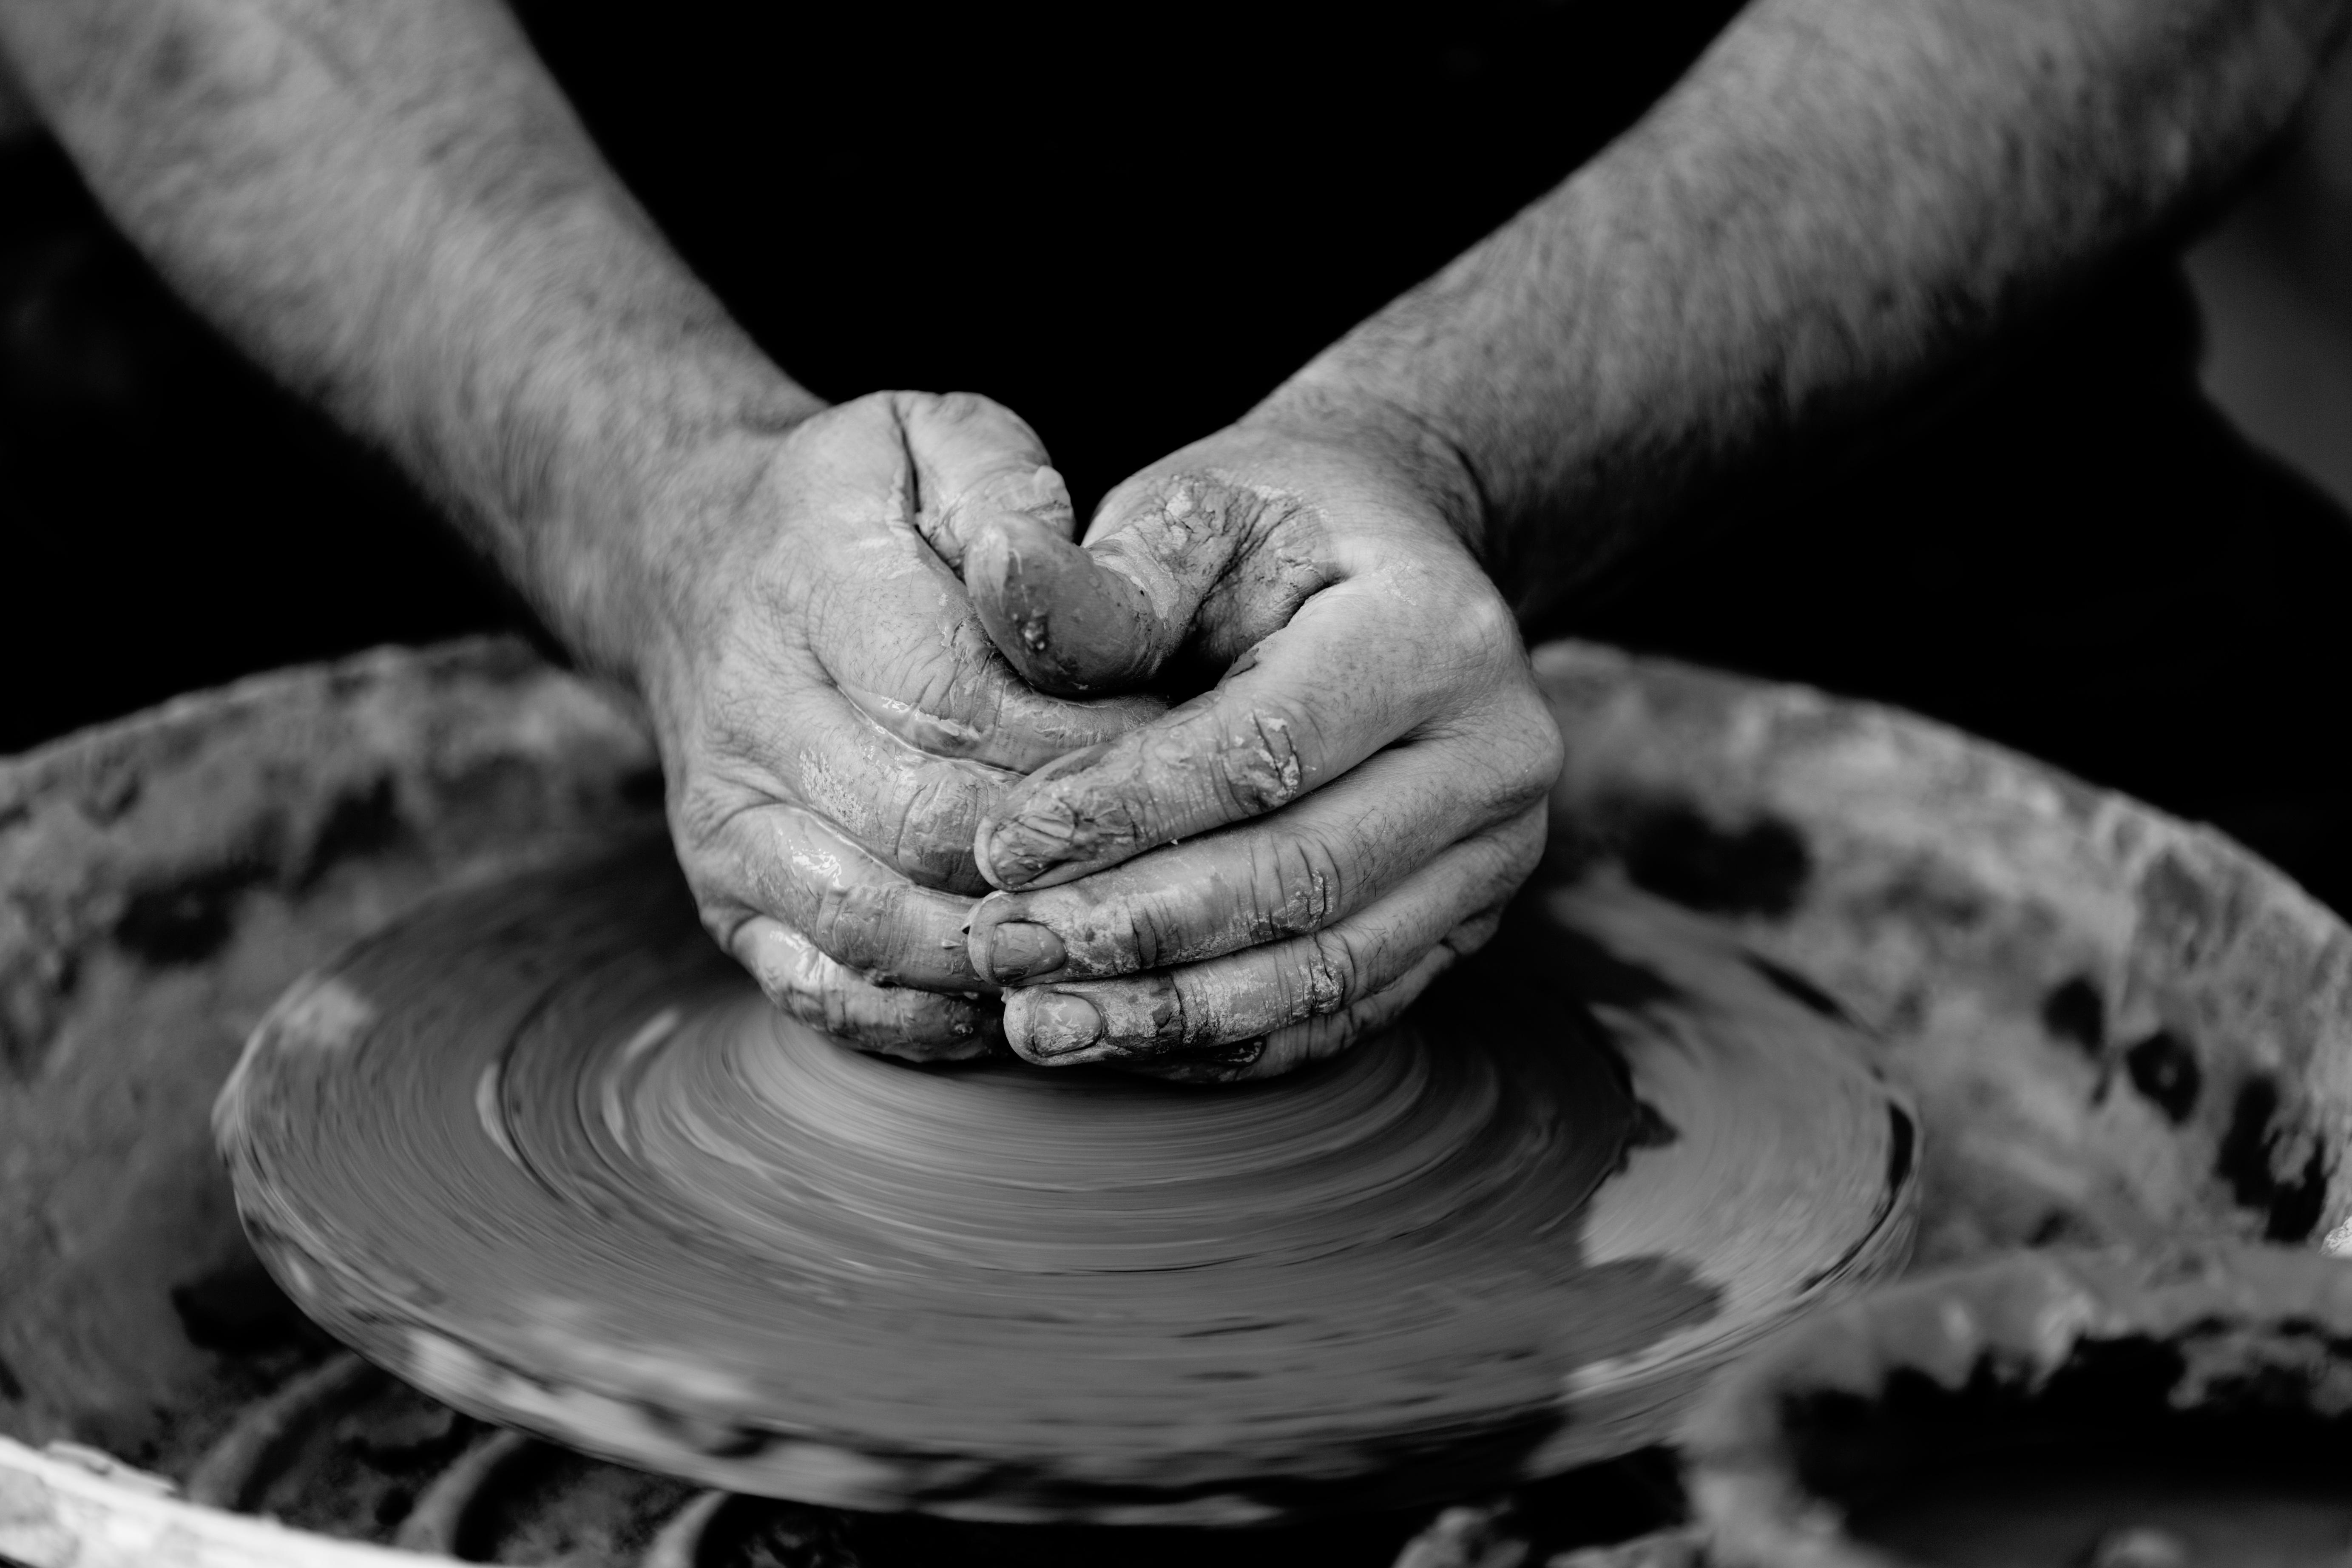 Hand black and white photography wheel ceramic machine black monochrome pottery circle close up art macro